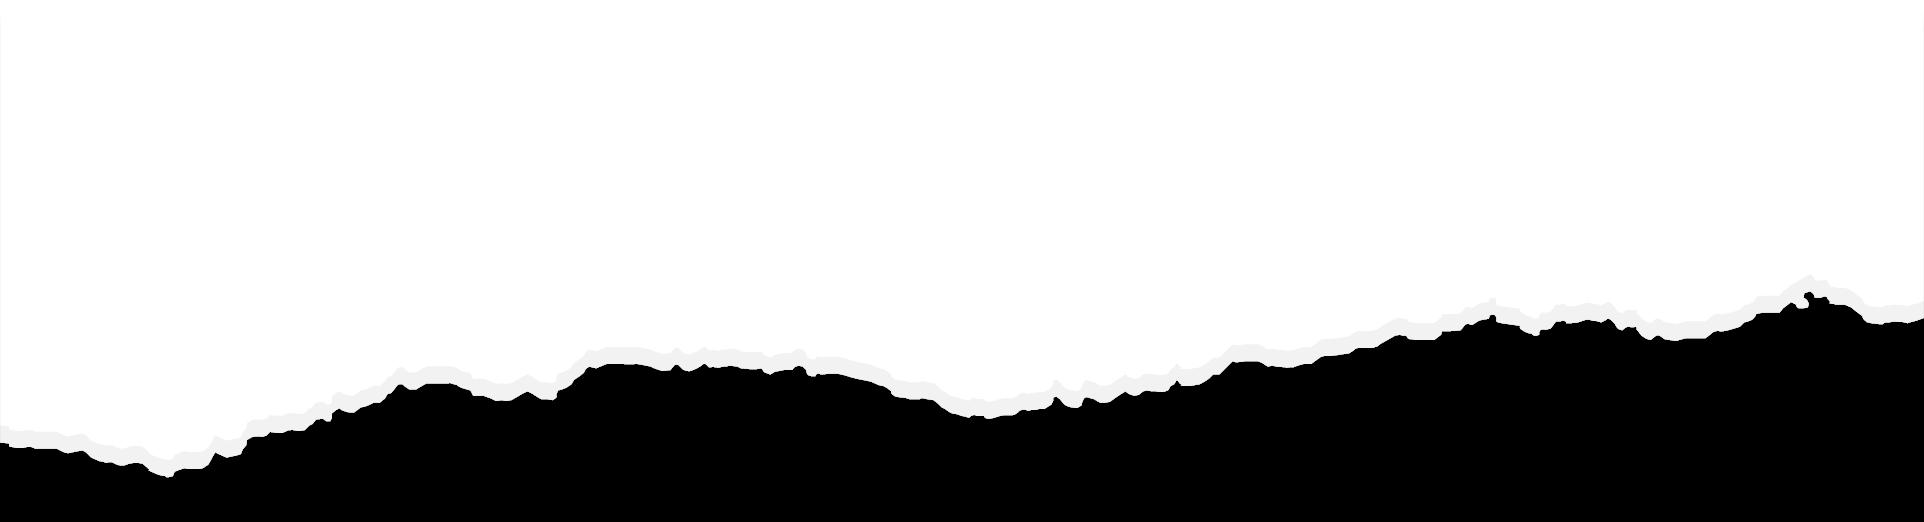 NitroTaps - Website Sketch 01-16.png